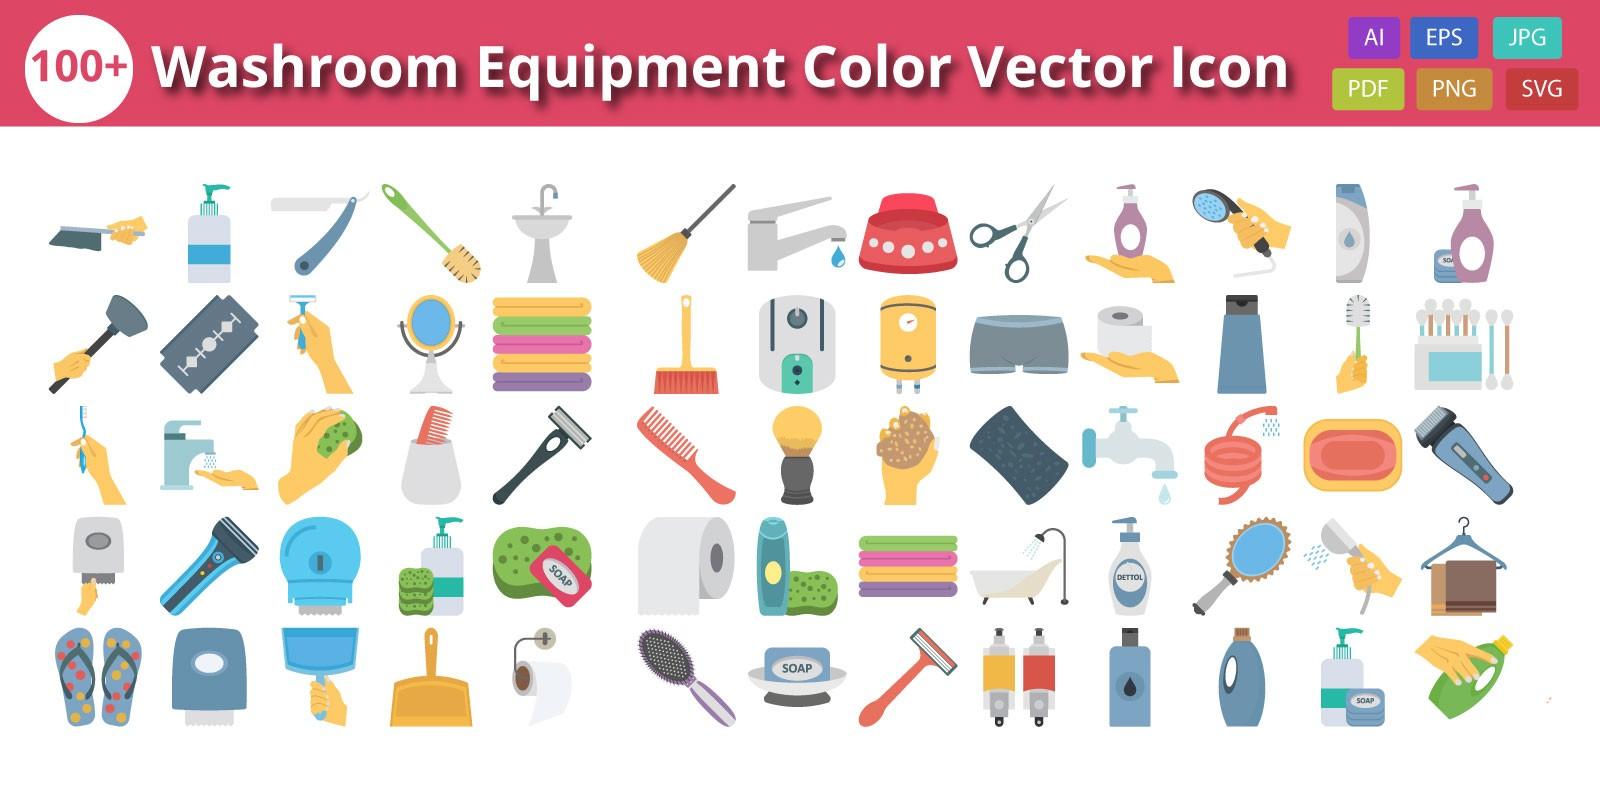 Washroom Equipment Color Vector Icon